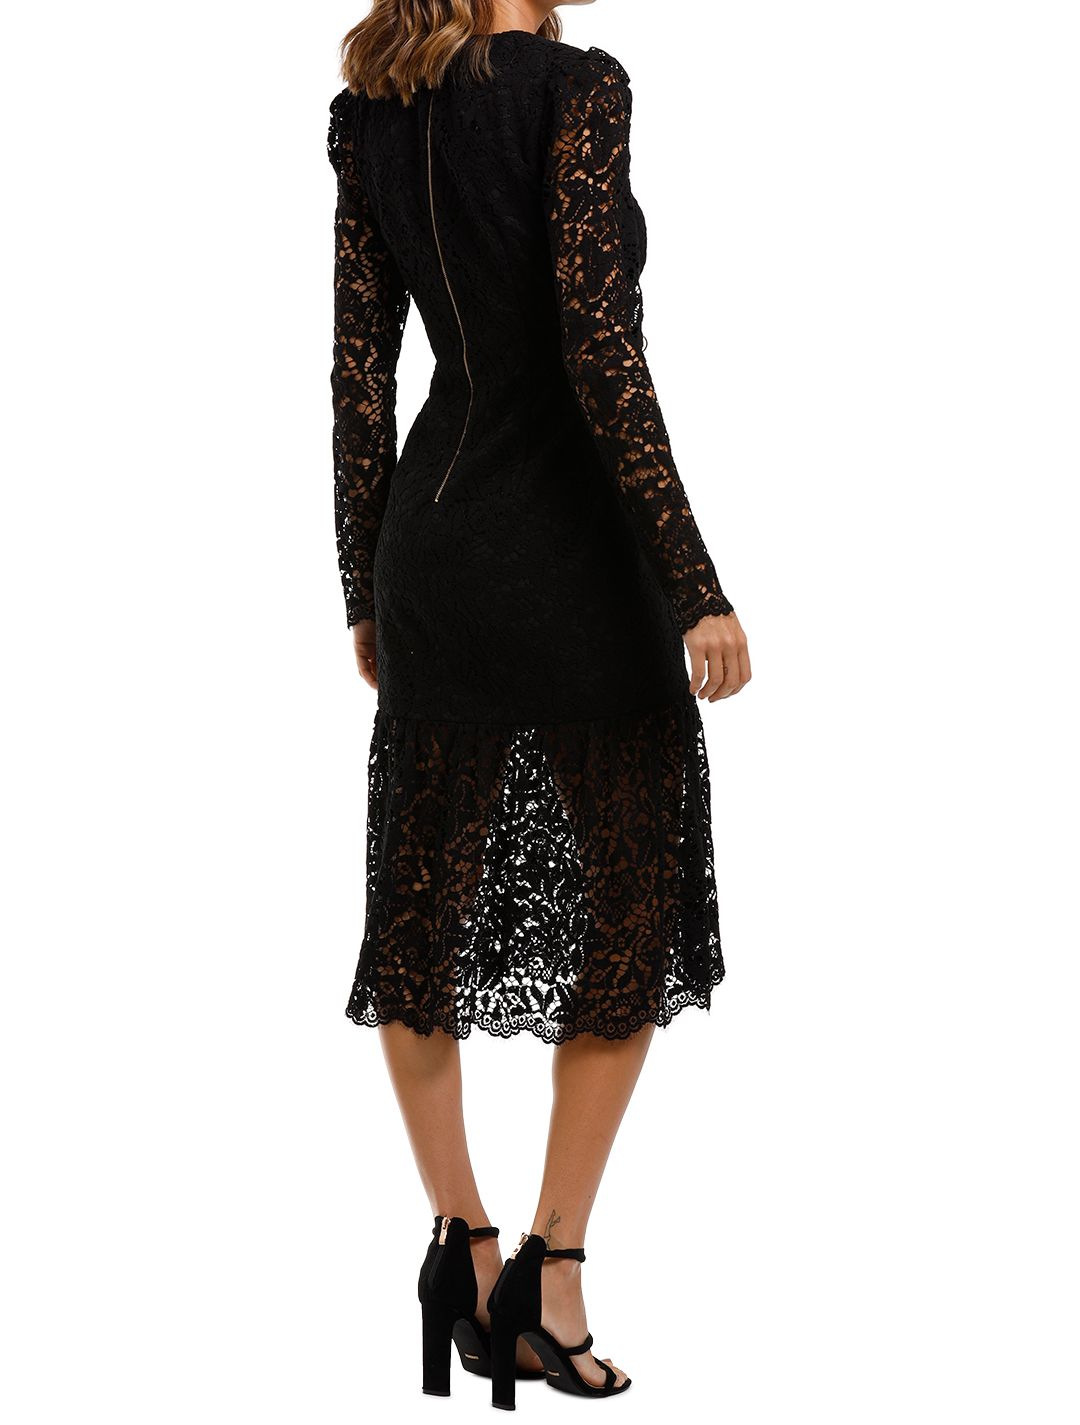 Rebecca Vallance Le Saint Ruched Dress Black Midi